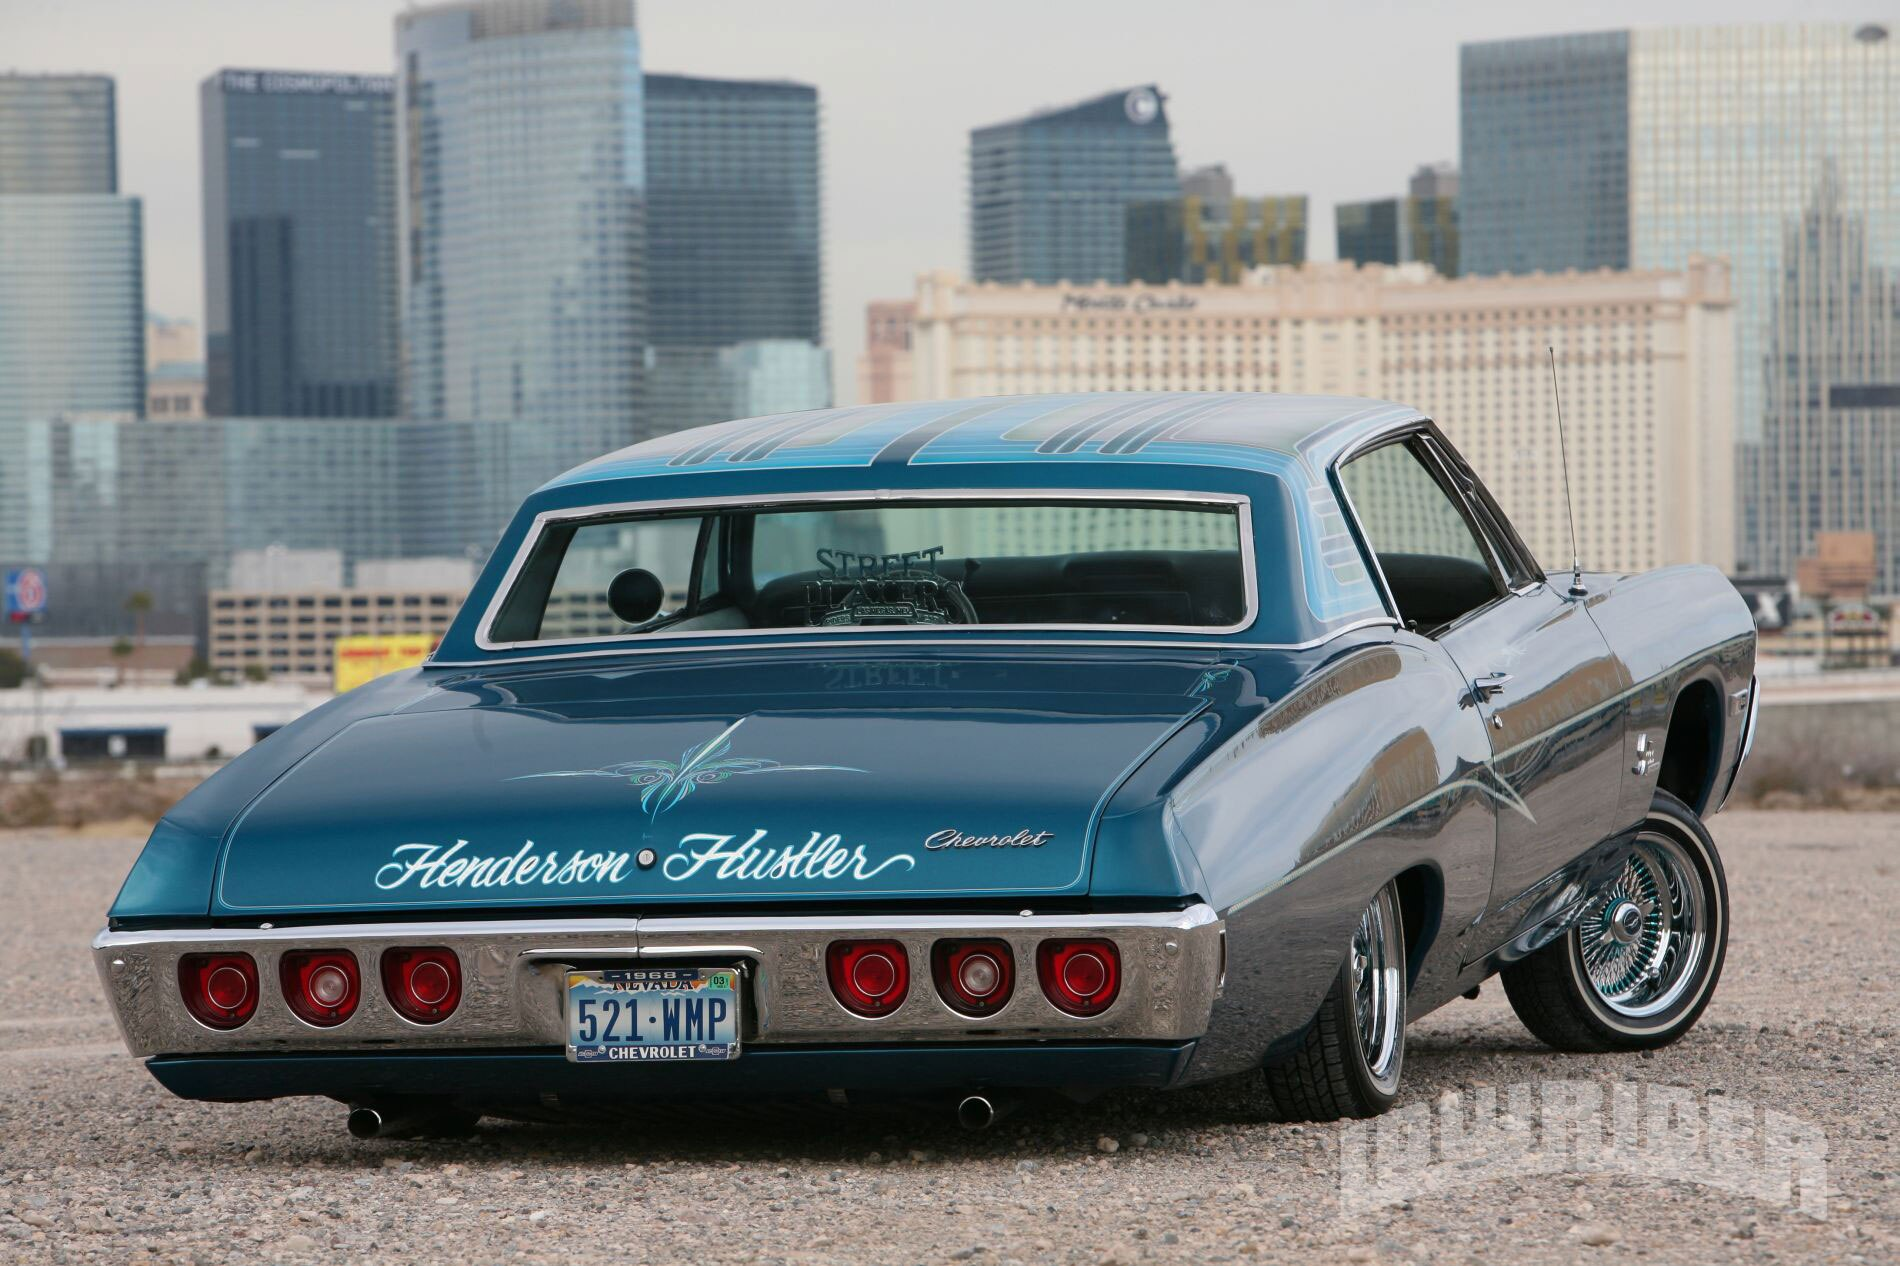 lrmp-1111-04-o-1968-chevrolet-impala-rear3